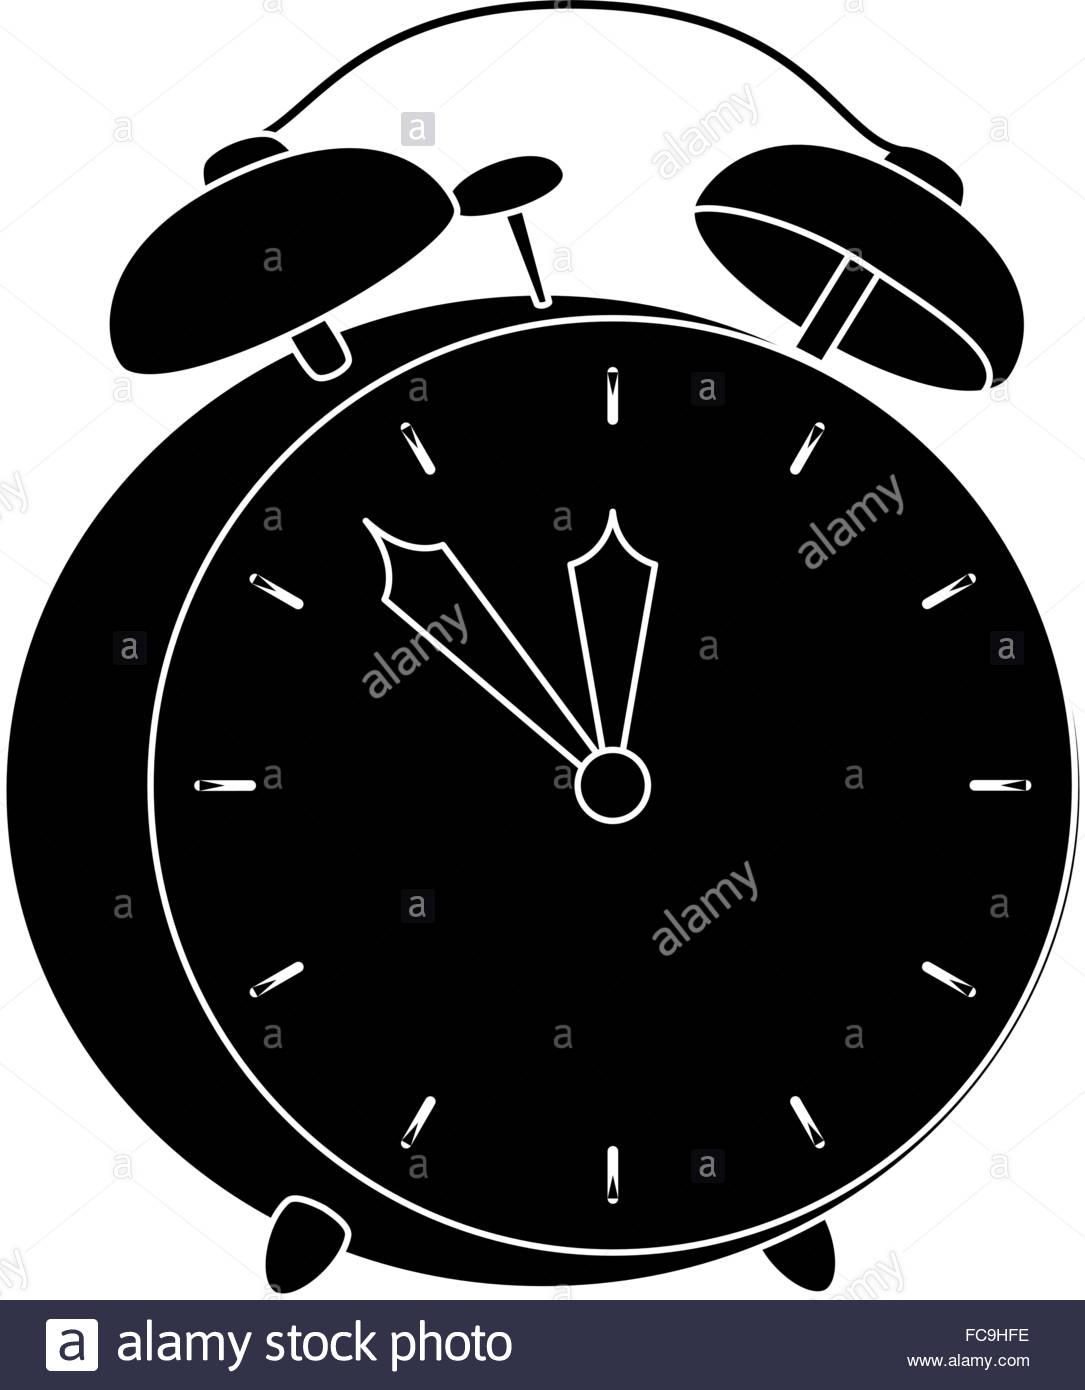 1085x1390 Vintage Alarm Clock Silhouette Stock Vector Art Amp Illustration